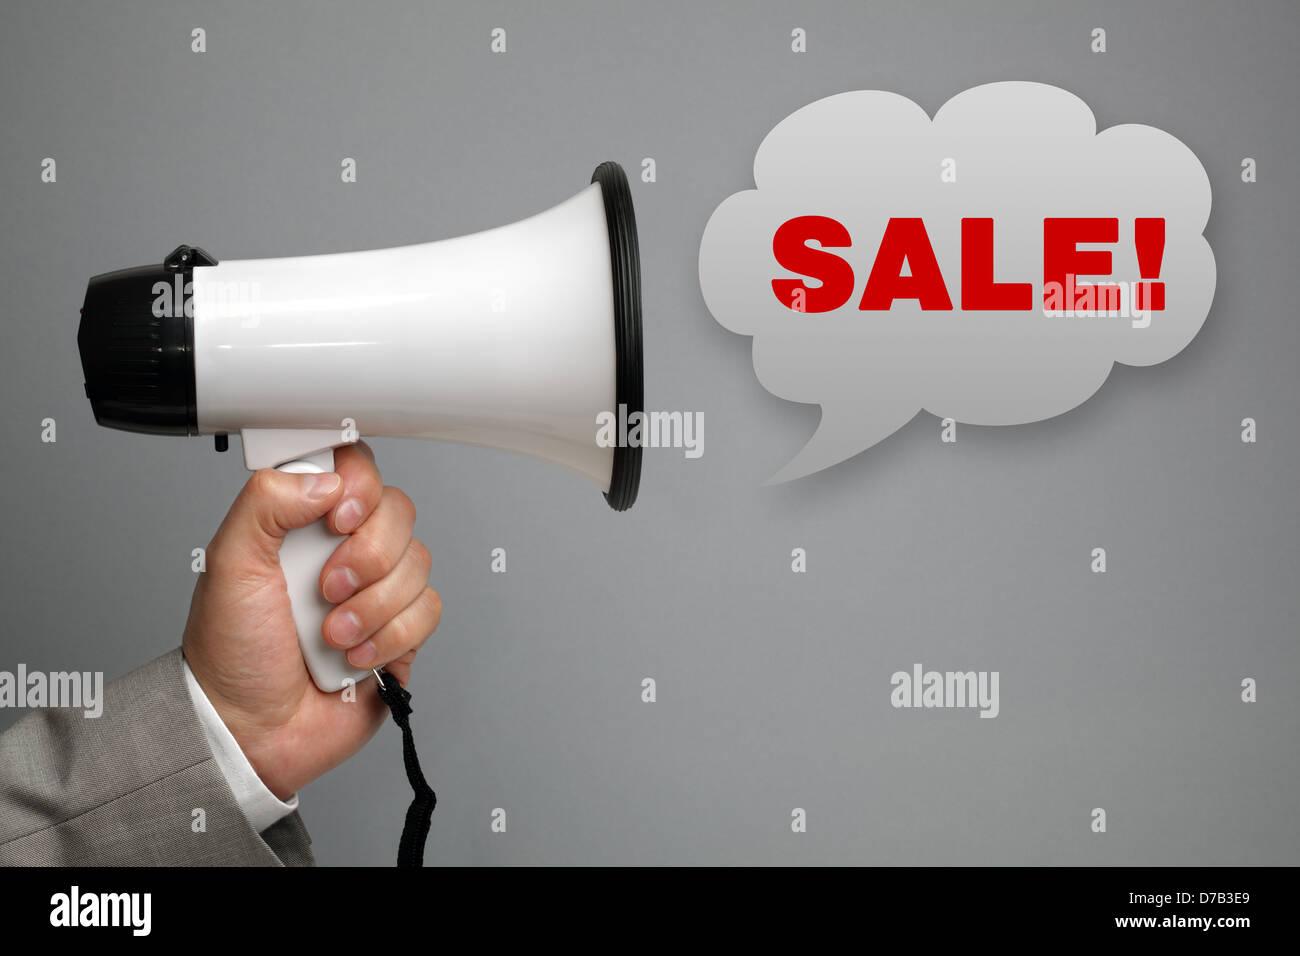 Megaphone shouting sale message - Stock Image